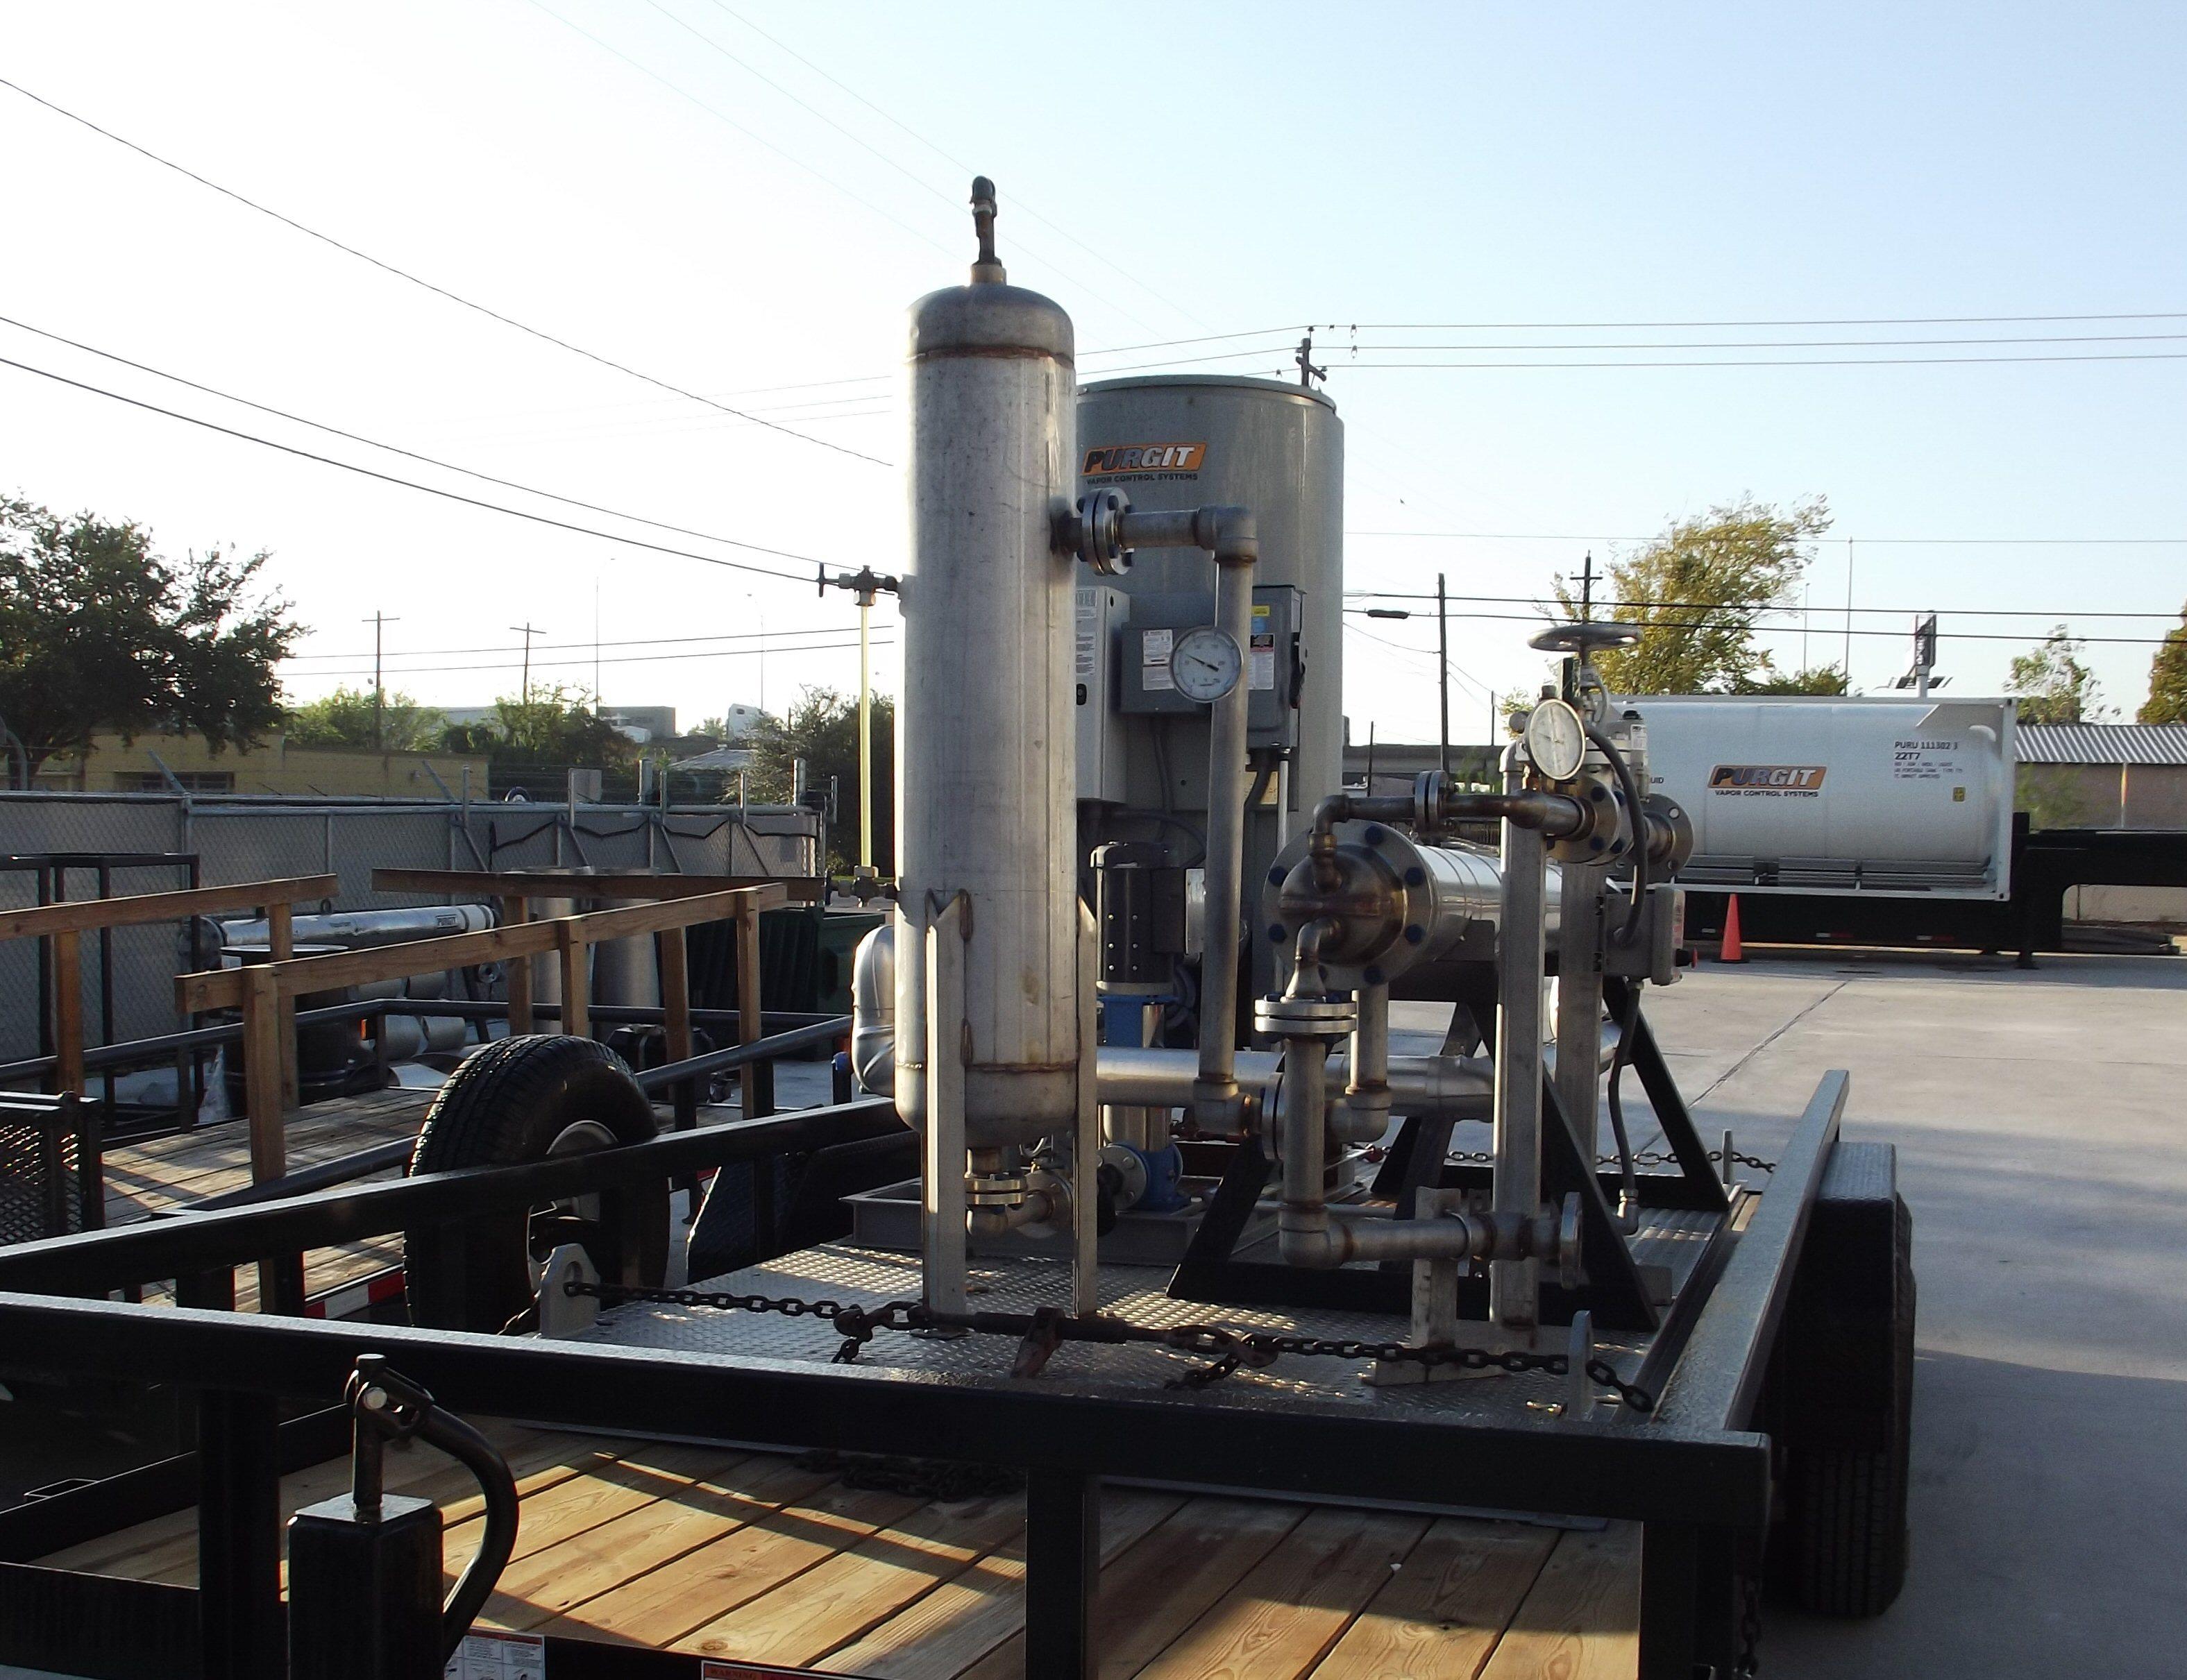 Ammonia Vaporizing Amp Purging Purgit Vapor Control And